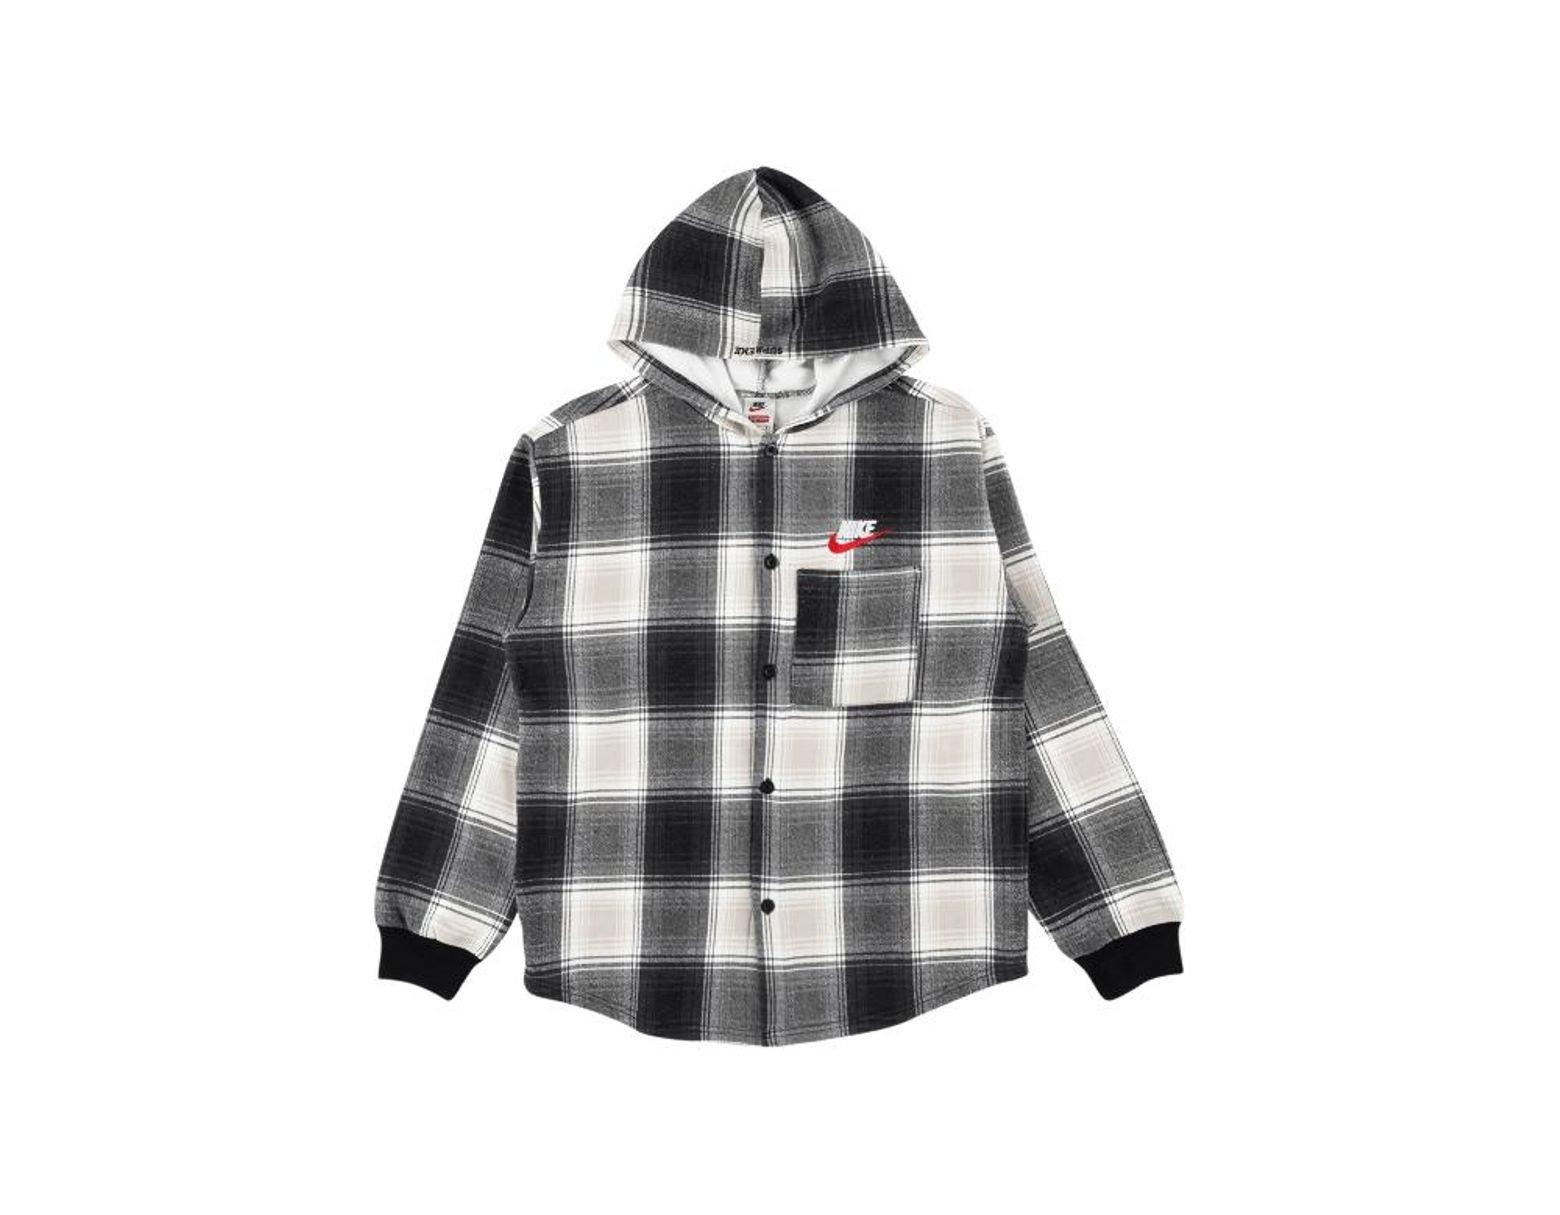 b7aa9c53 Supreme Nike Plaid Hooded Sweatshirt 'fw 18' in Black for Men - Save 2% -  Lyst